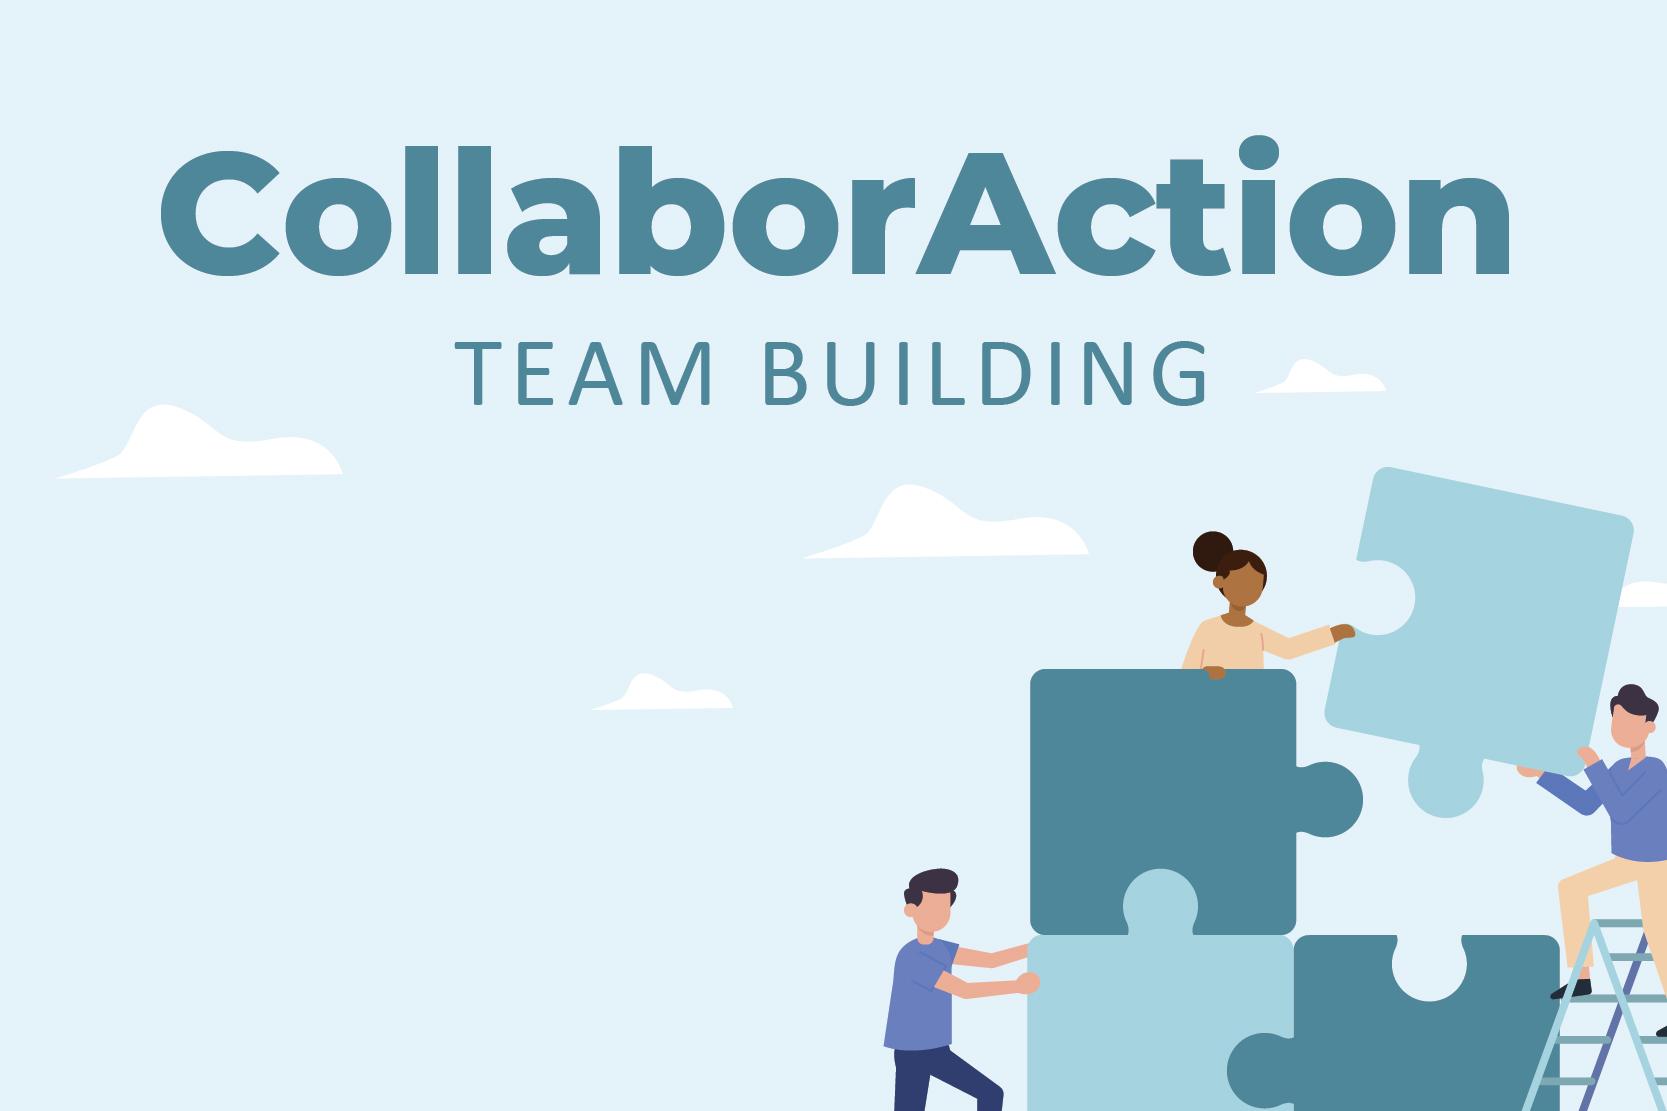 Cataolo Copertina Web-TemBuilding_CollaborAction-11